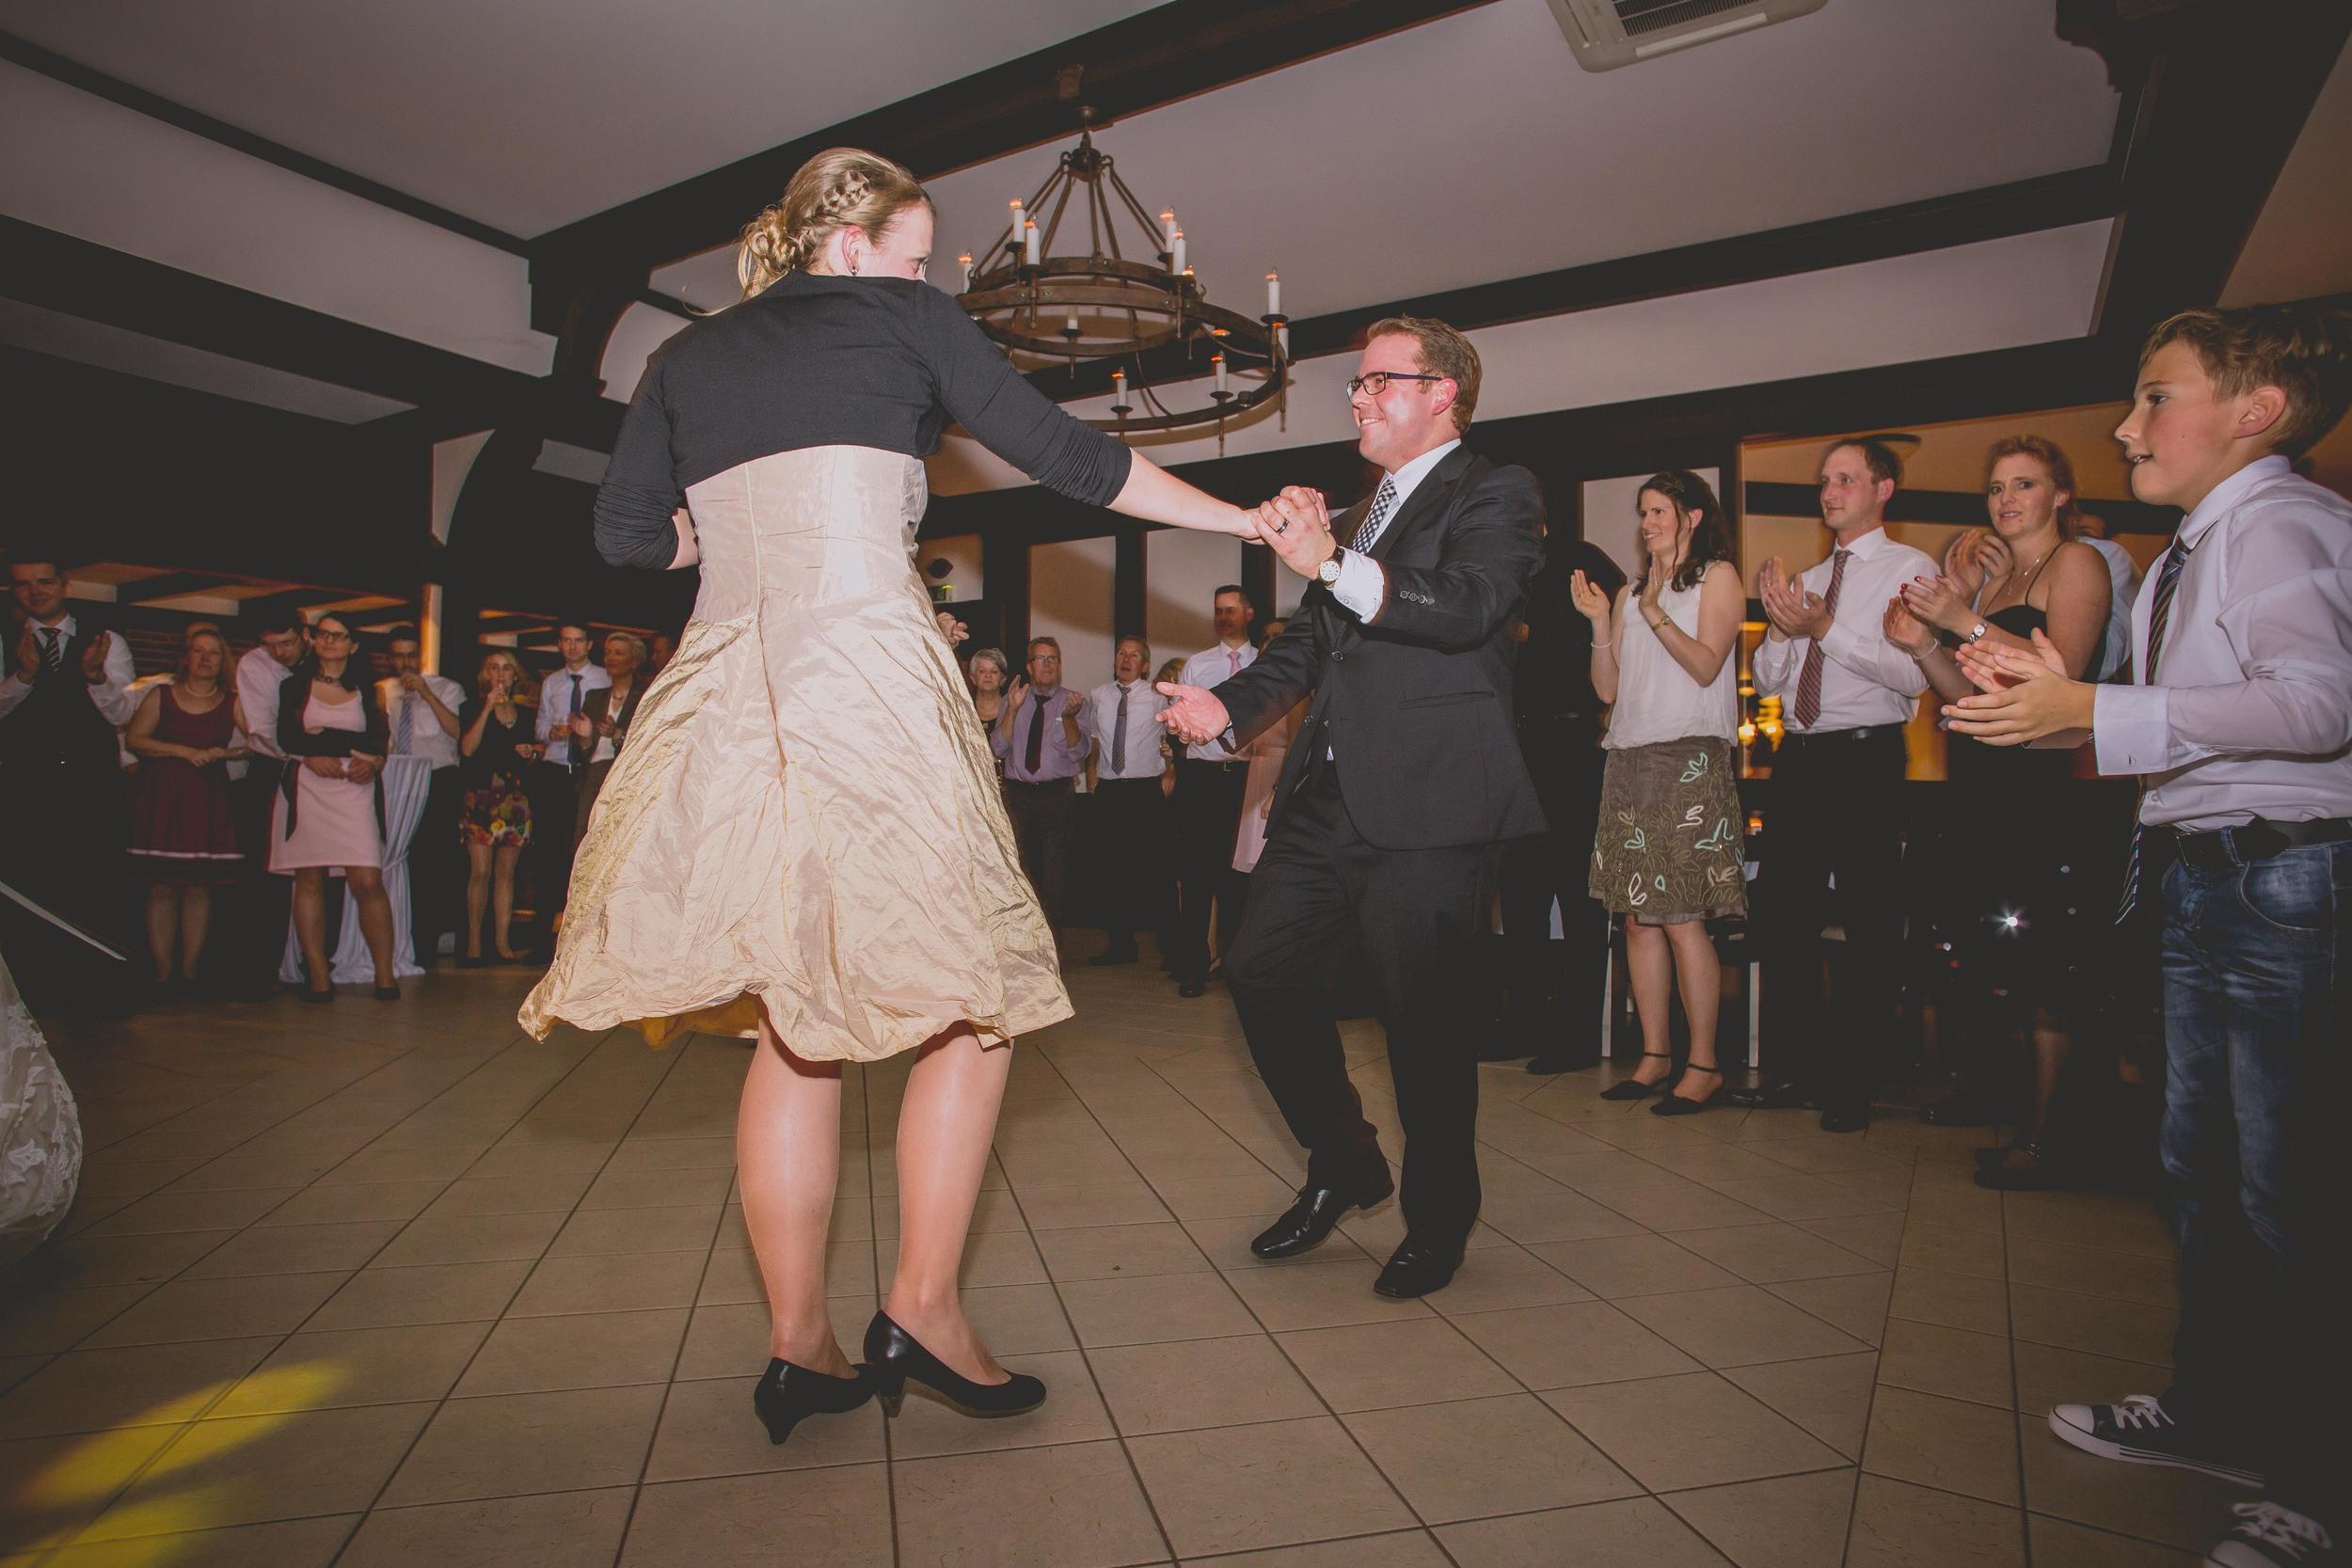 Buffalo-Wedding-Photography-by-Stefan-Ludwig10252014WEB-89.jpg